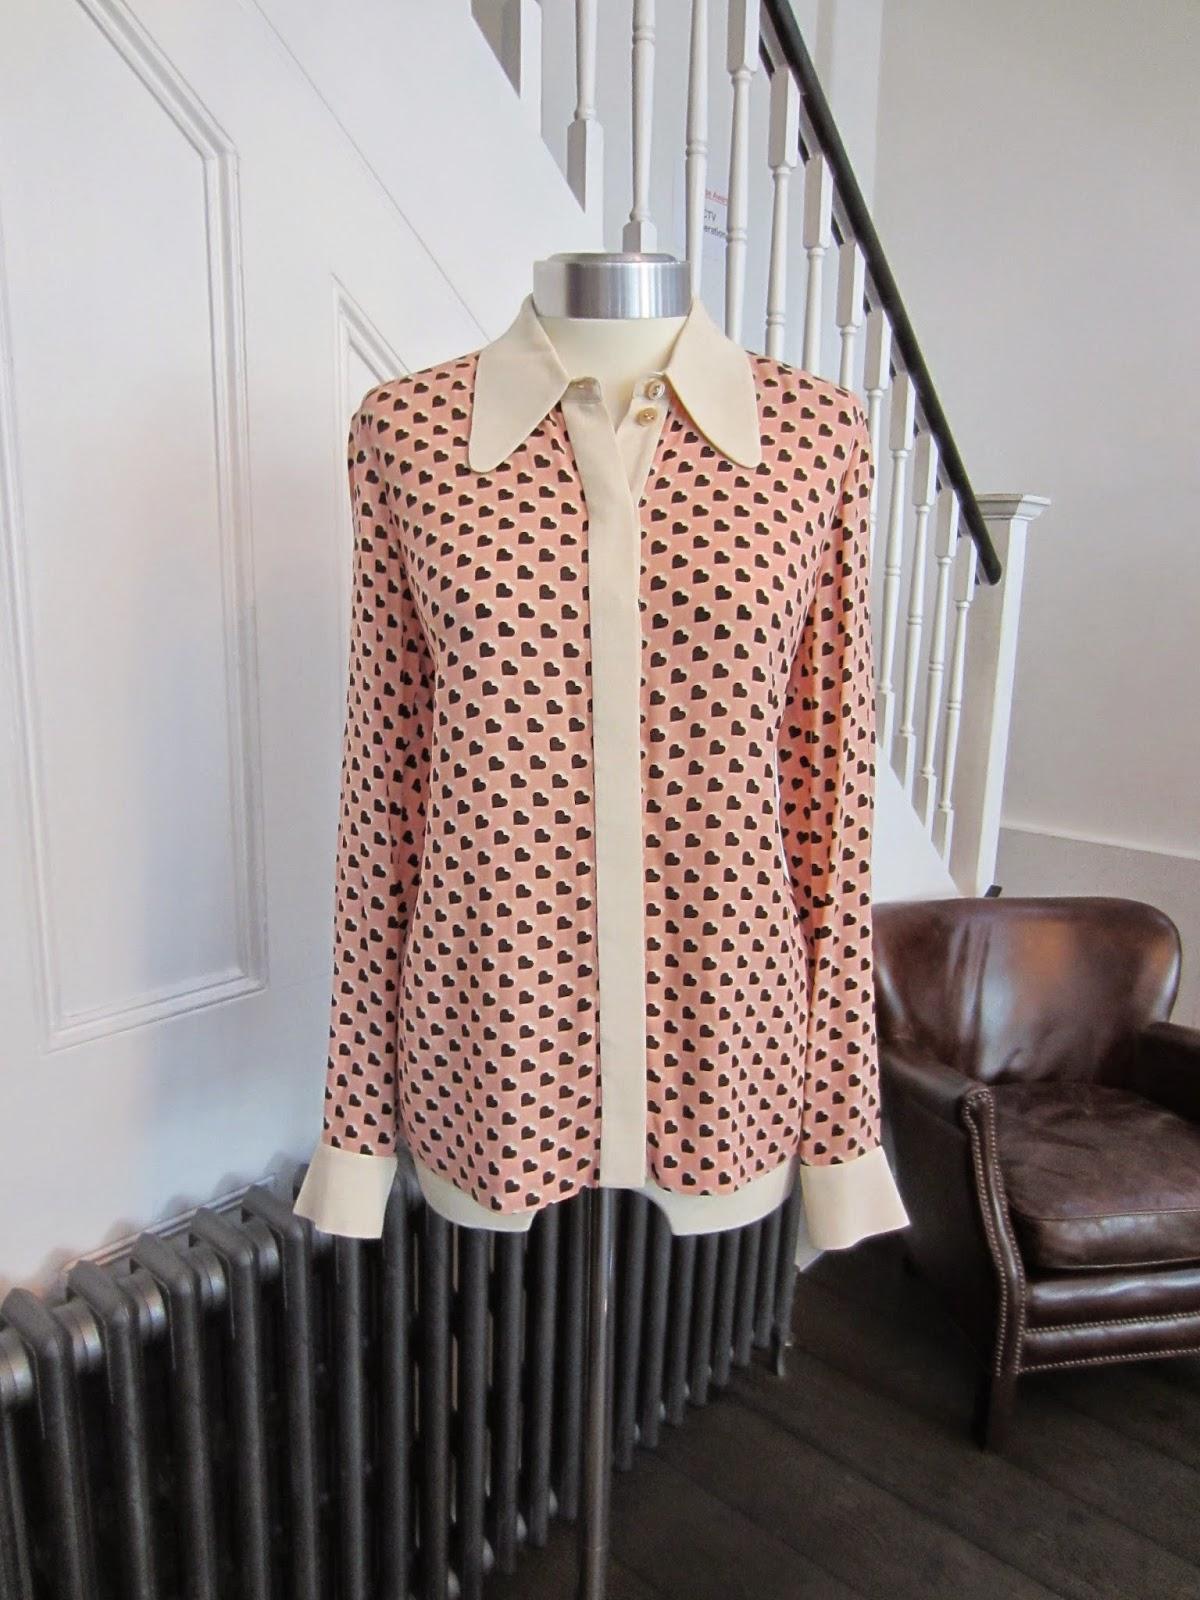 Orla Kiely Pink & Cream Heart Print Blouse